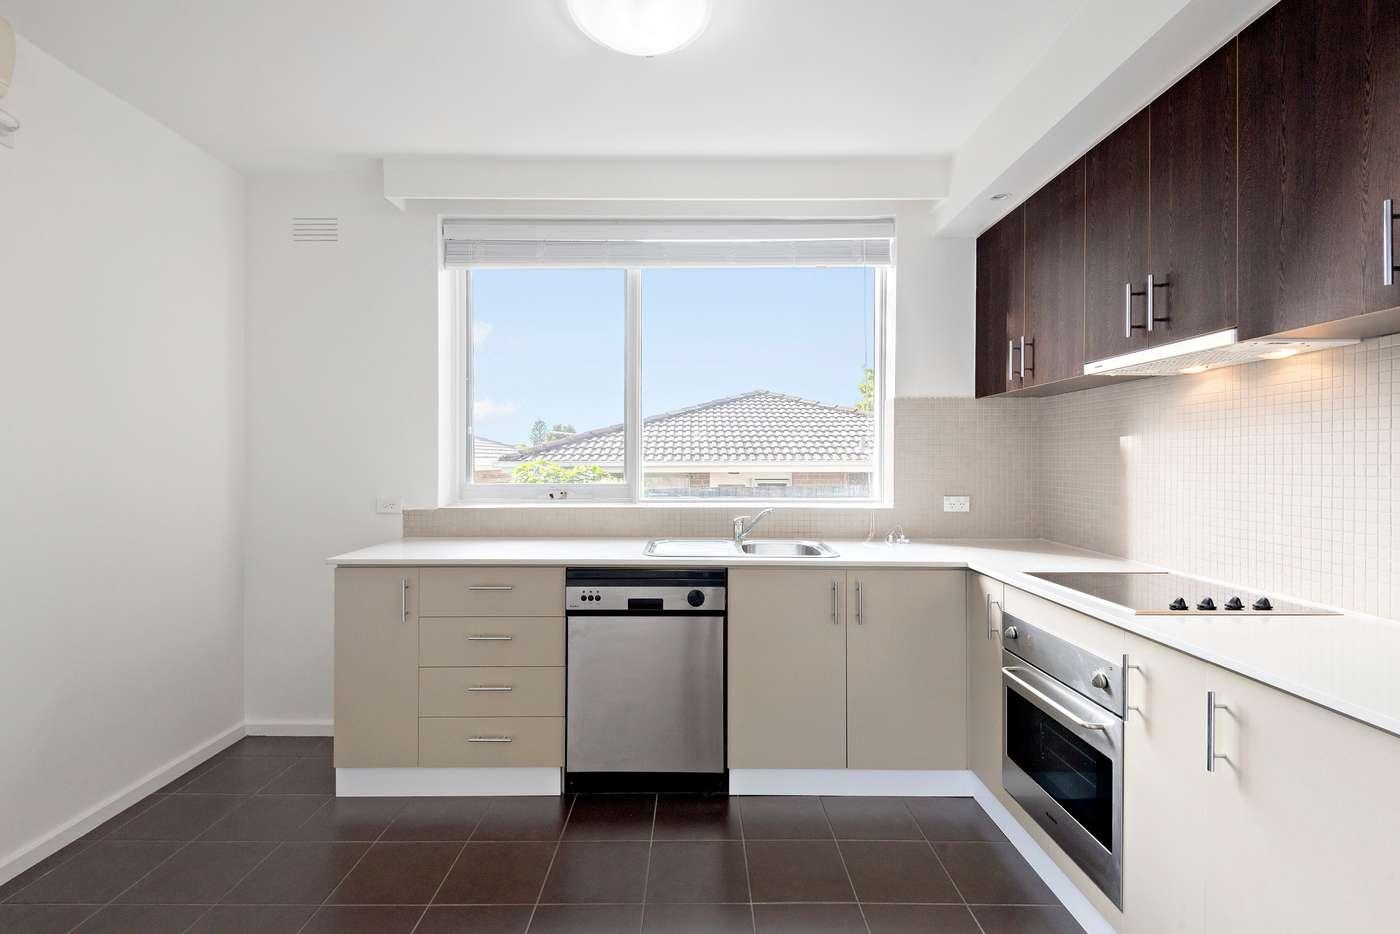 Main view of Homely apartment listing, 4/49 Wilson Street, Cheltenham VIC 3192